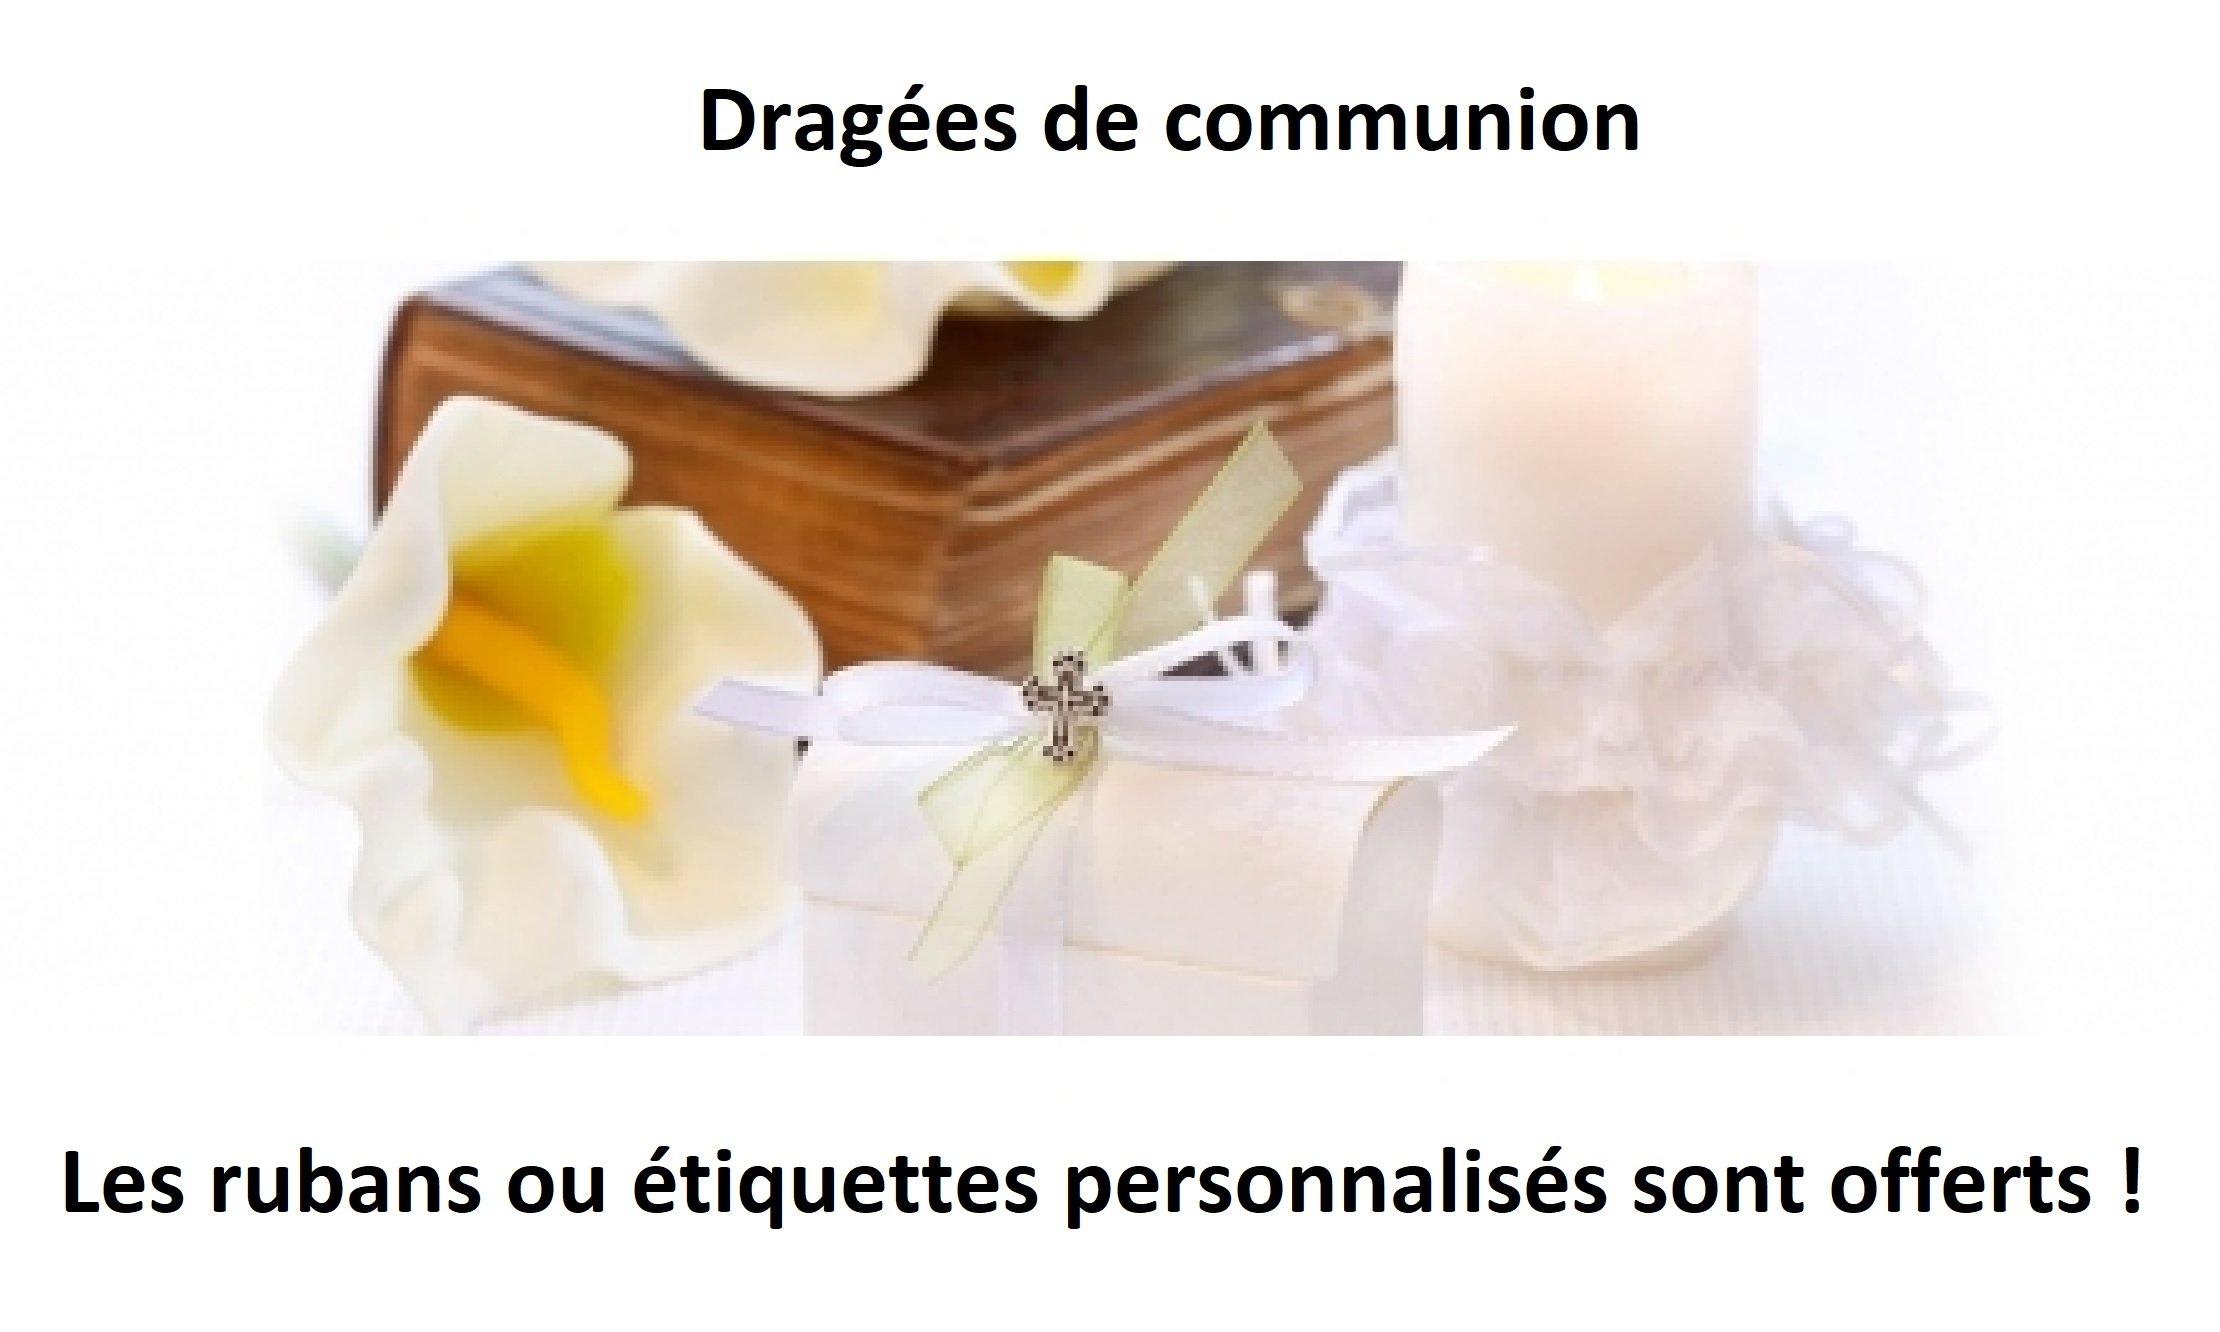 Achat dragees communion en Normandie